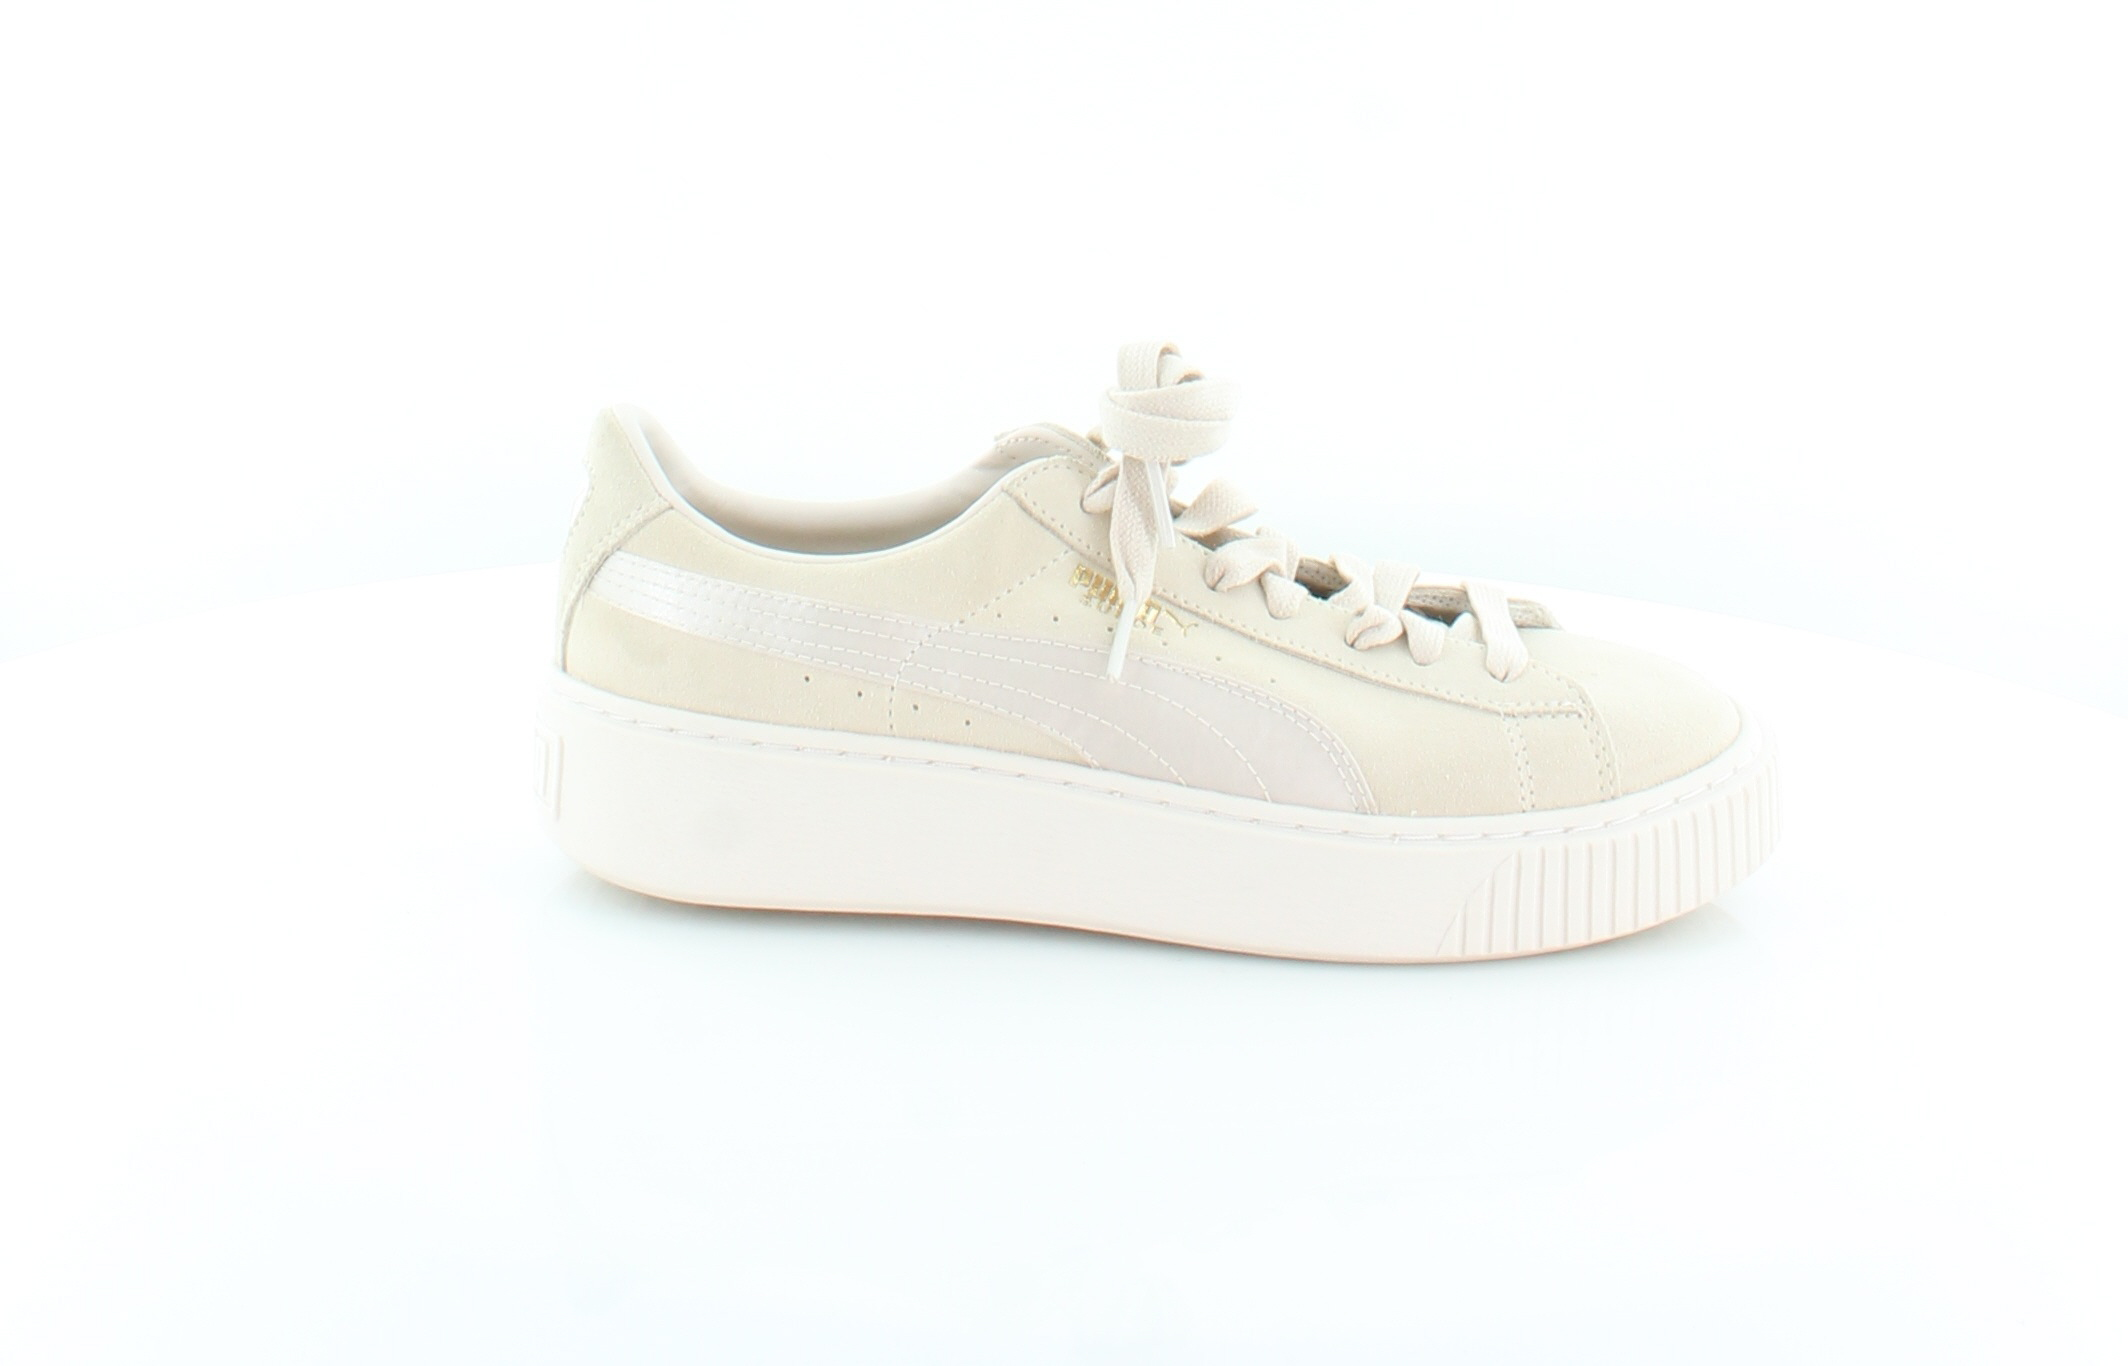 0c6d7499667ade Image is loading Puma-New-Basket-Platform-Beige-Womens-Shoes-Size-